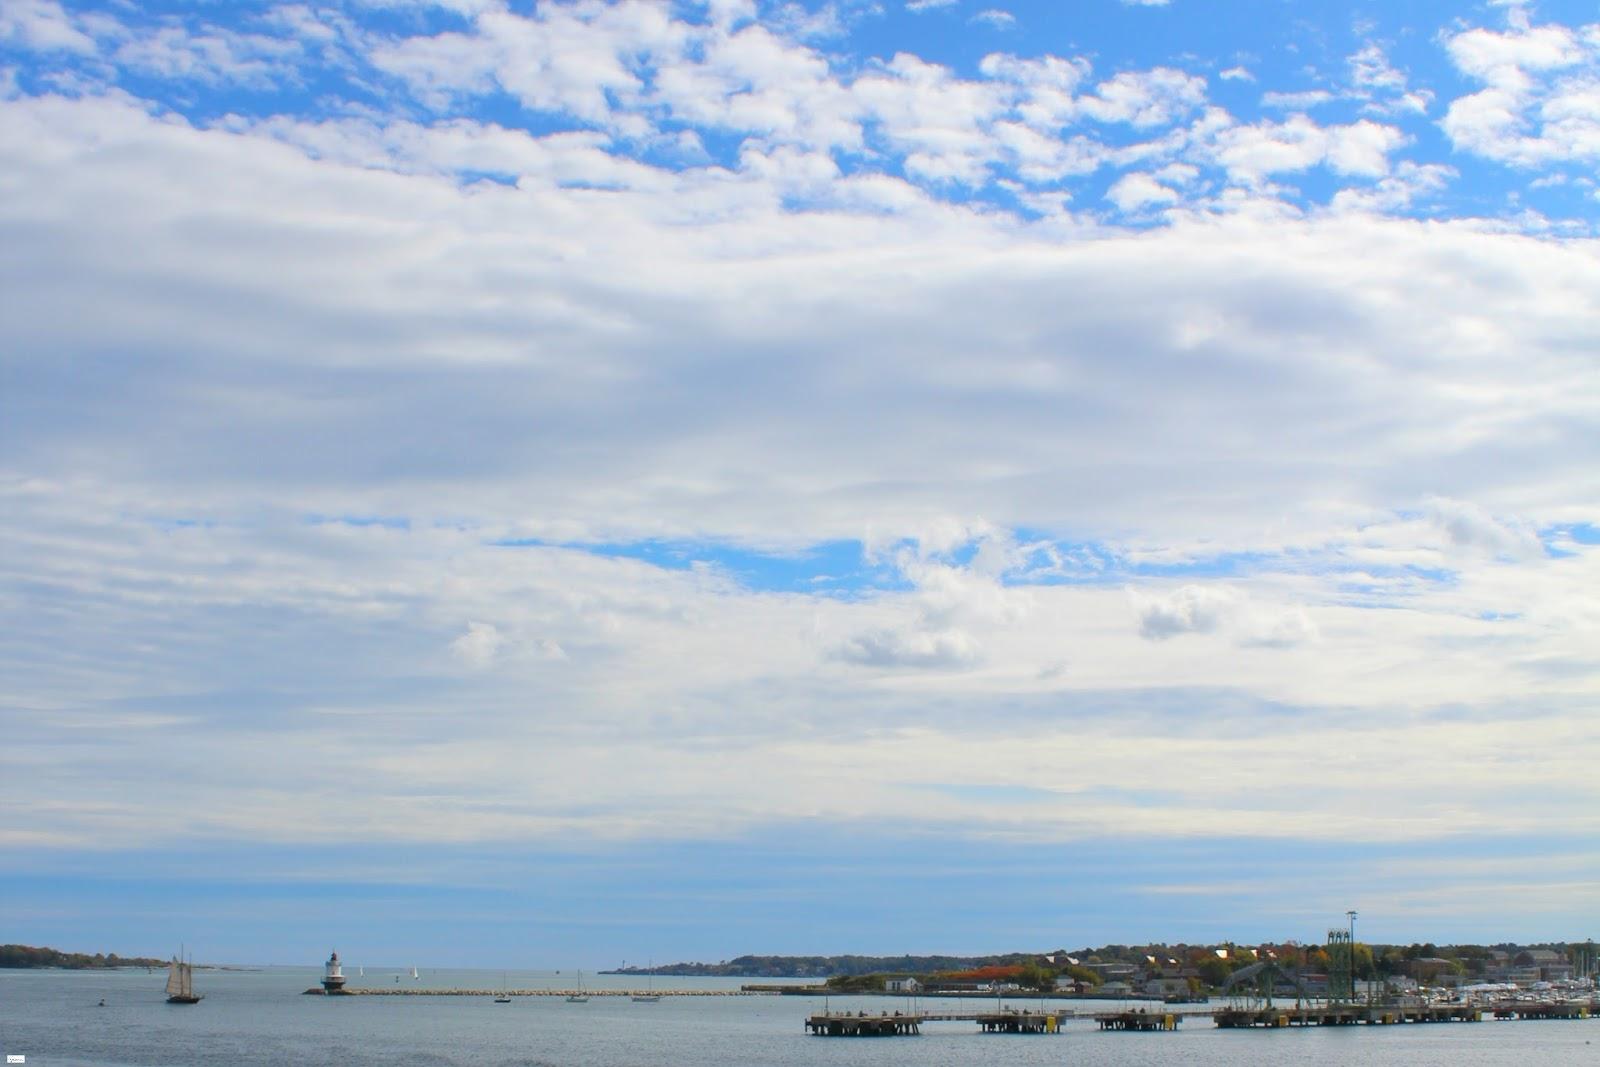 Cat Ferry From Yarmouth Nova Scotia To Portland Maine